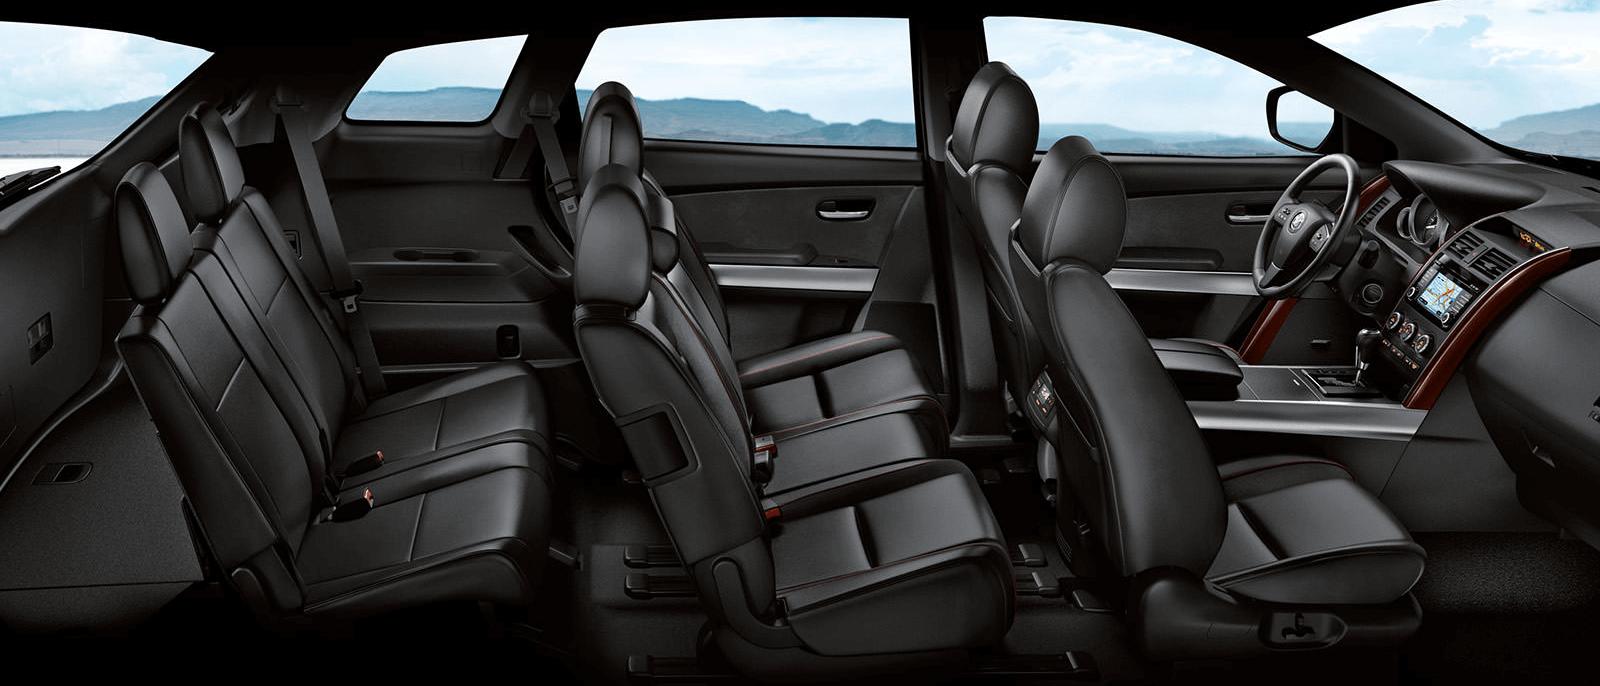 2015 Mazda5 seat slider